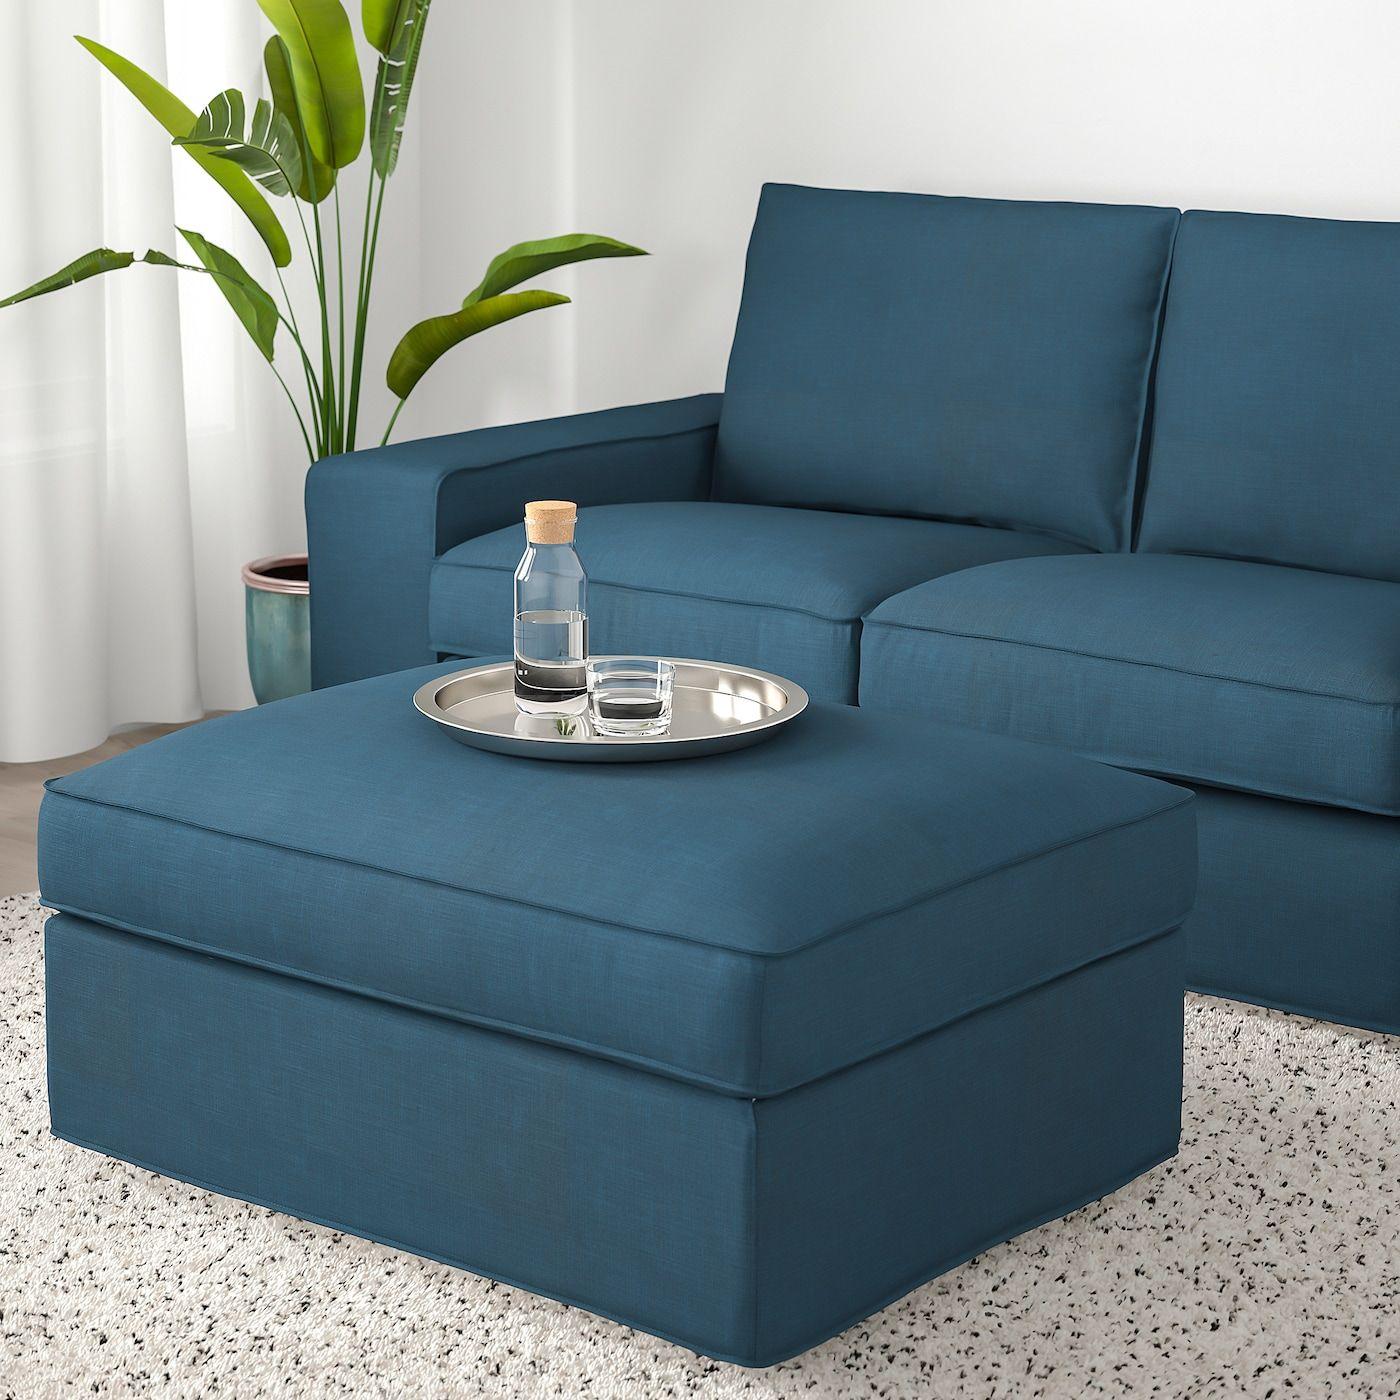 Ikea Kivik Footstool With Storage In 2020 Storage Footstool